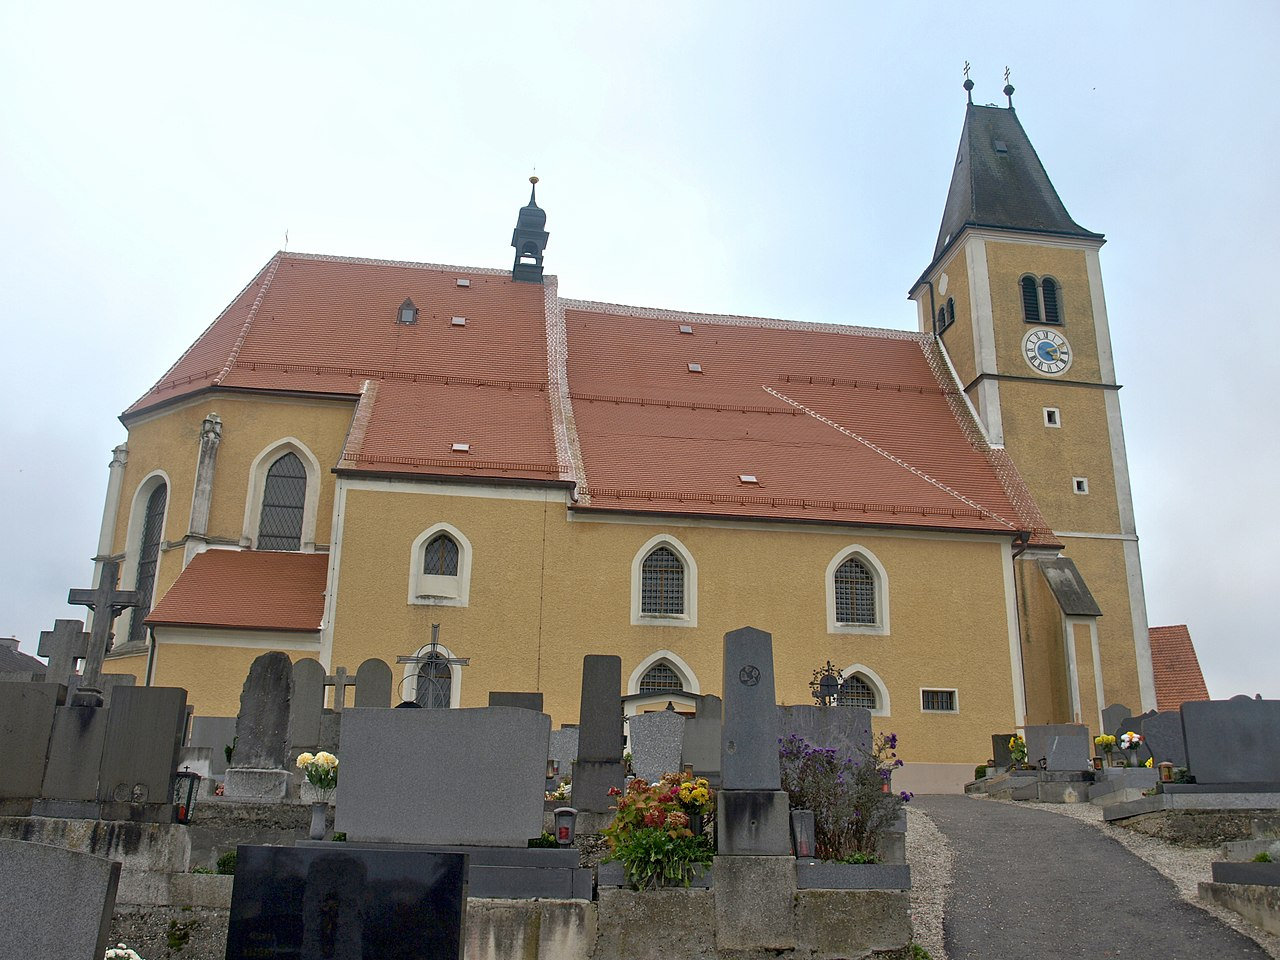 1280px-2012.10.21_-_Strengberg_Pfarrkirche_Mariae_Himmelfahrt_-_02.jpg